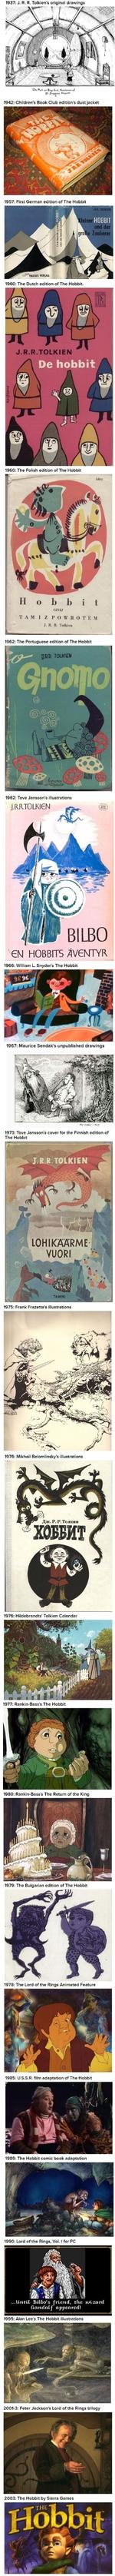 De hobbit Until В 1937: J. R. R. Tolkien's original drawings Ег»Л,of 1942: Children's Book Club edition's dust jacket 1957: First German edition of The Hobbit PAULUS VERLAG 1960: The Dutch edition of The Hobbit J.R.R.TOLKIE 1960: The Polish edition of The Hobbit CZYLI J. R. R. Tolkien